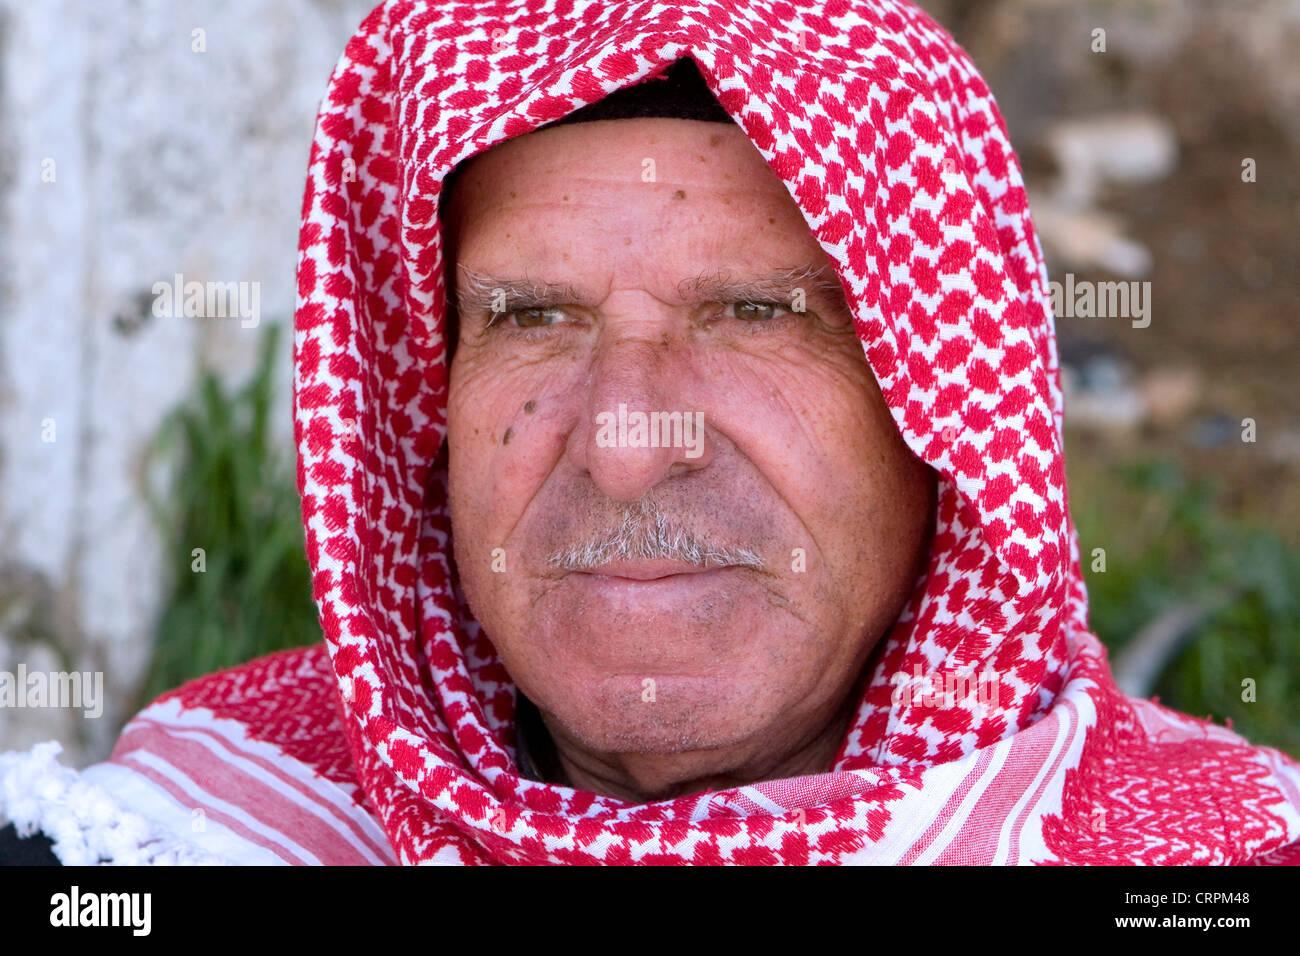 Arab man, Jerusalem, Israel - Stock Image